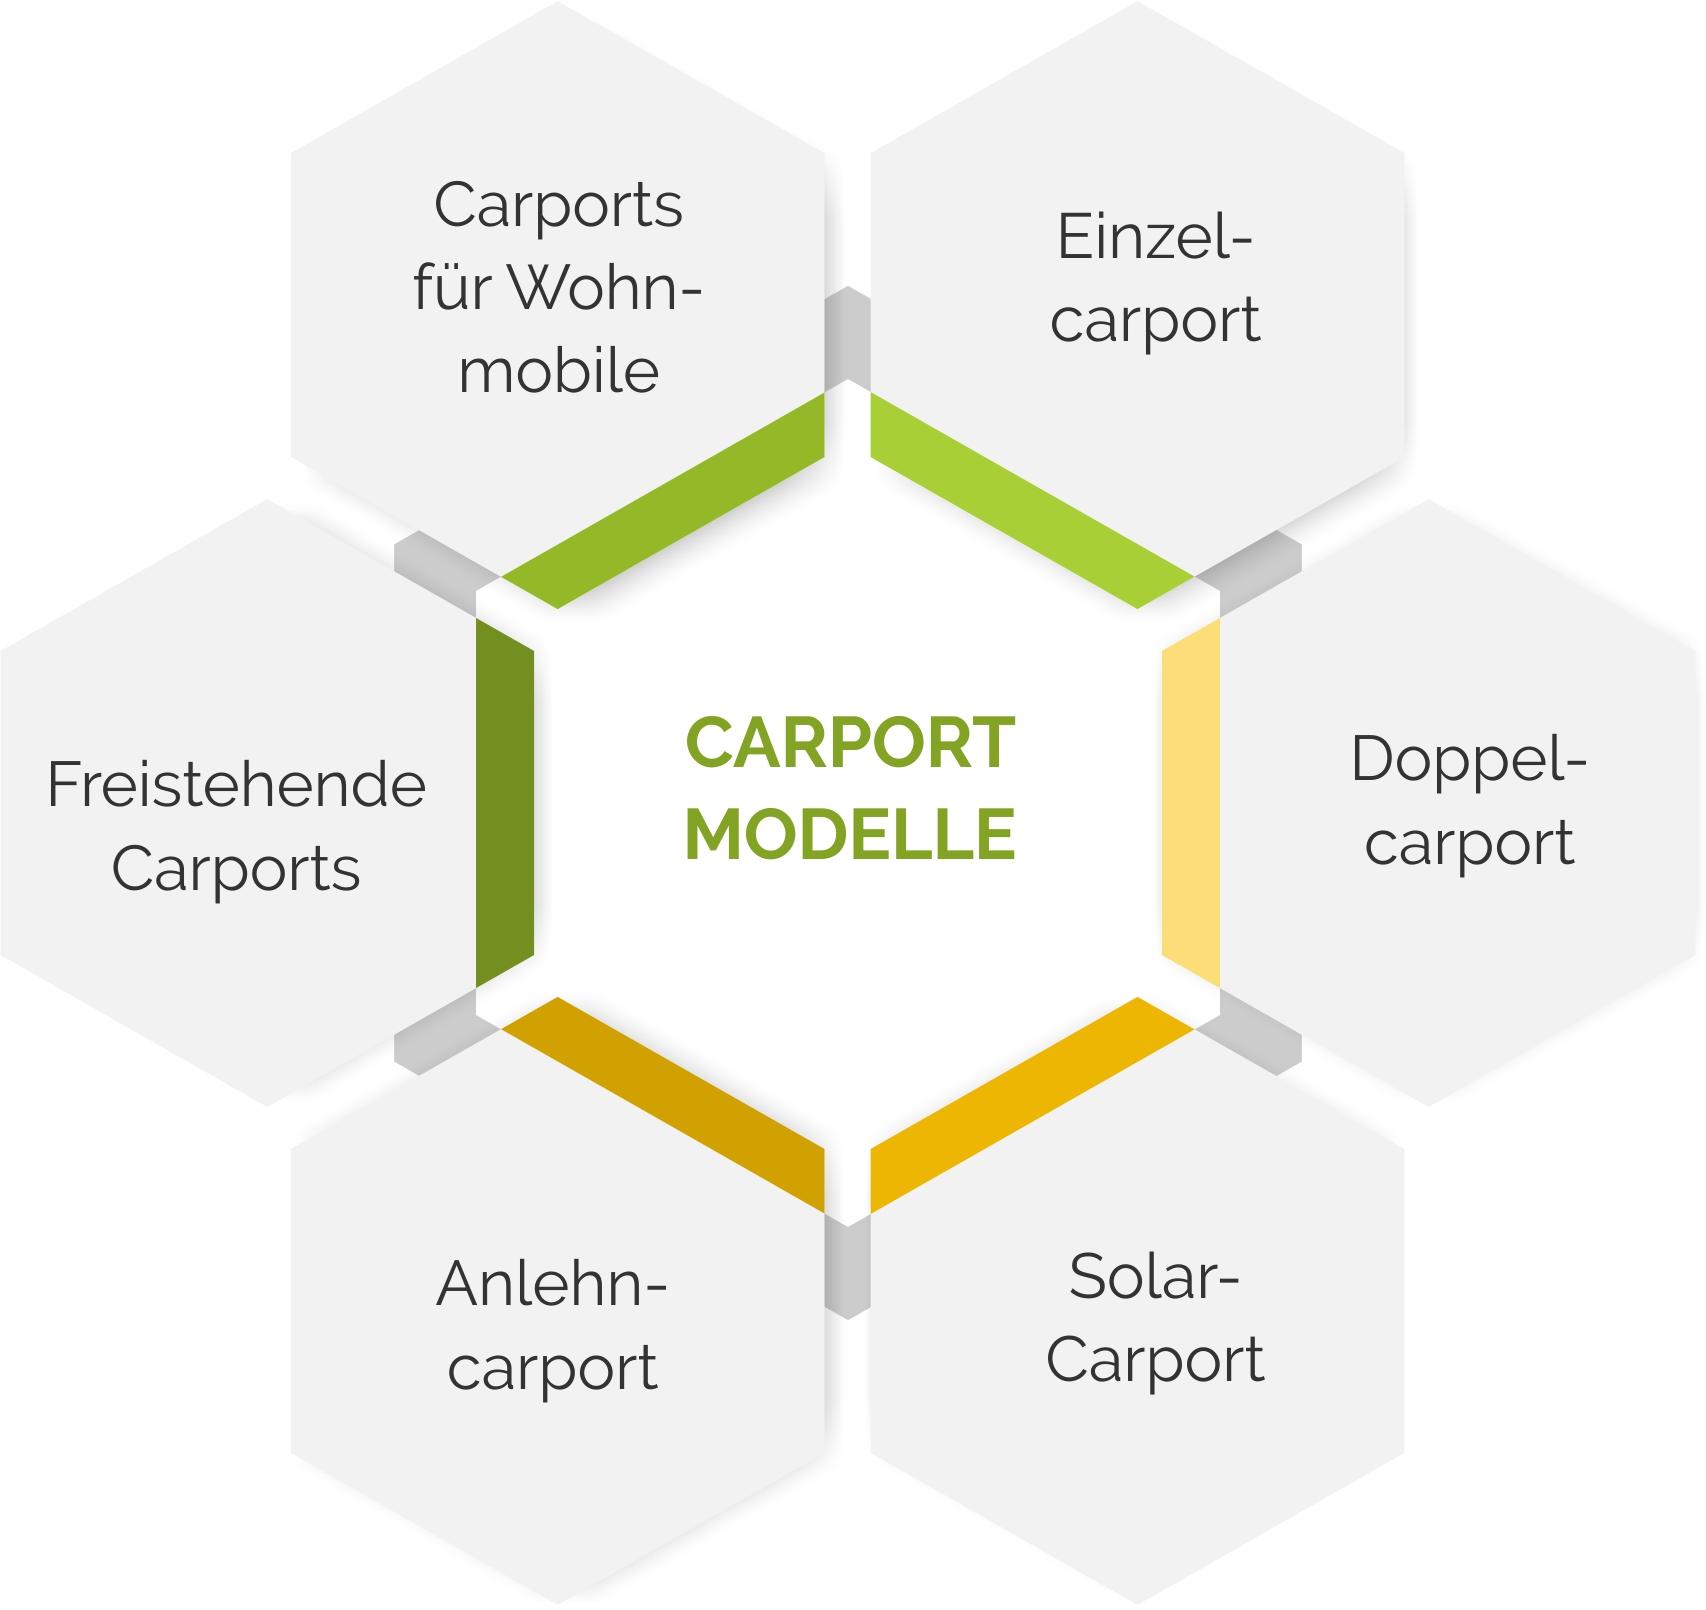 Carport-Modelle im Überblick